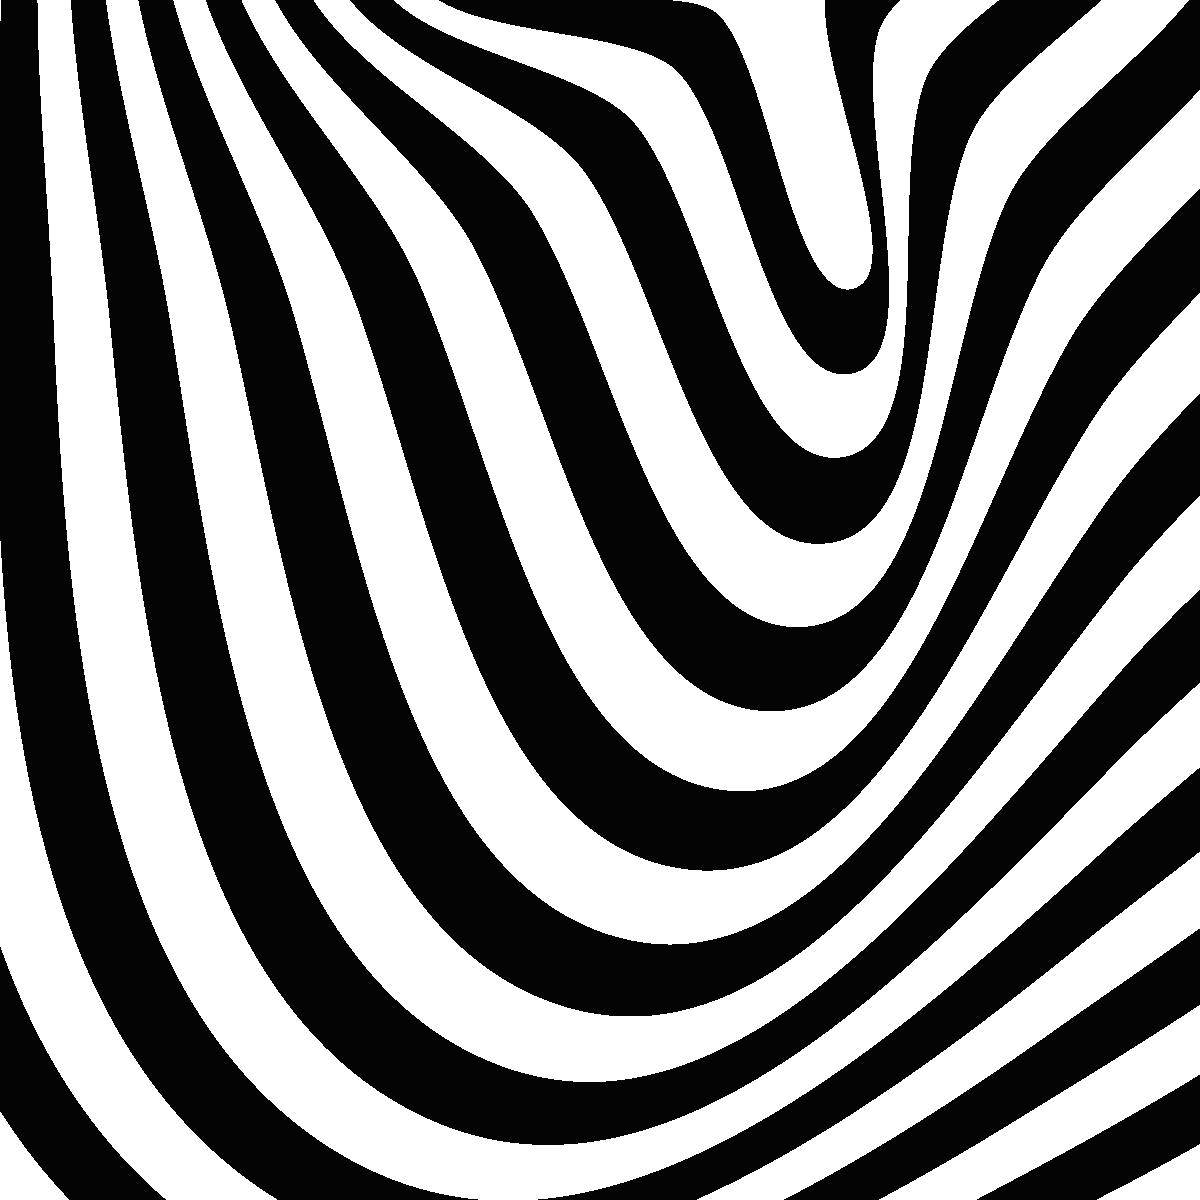 stickers muraux design sticker mural illusion d 39 optique 5 ambiance. Black Bedroom Furniture Sets. Home Design Ideas